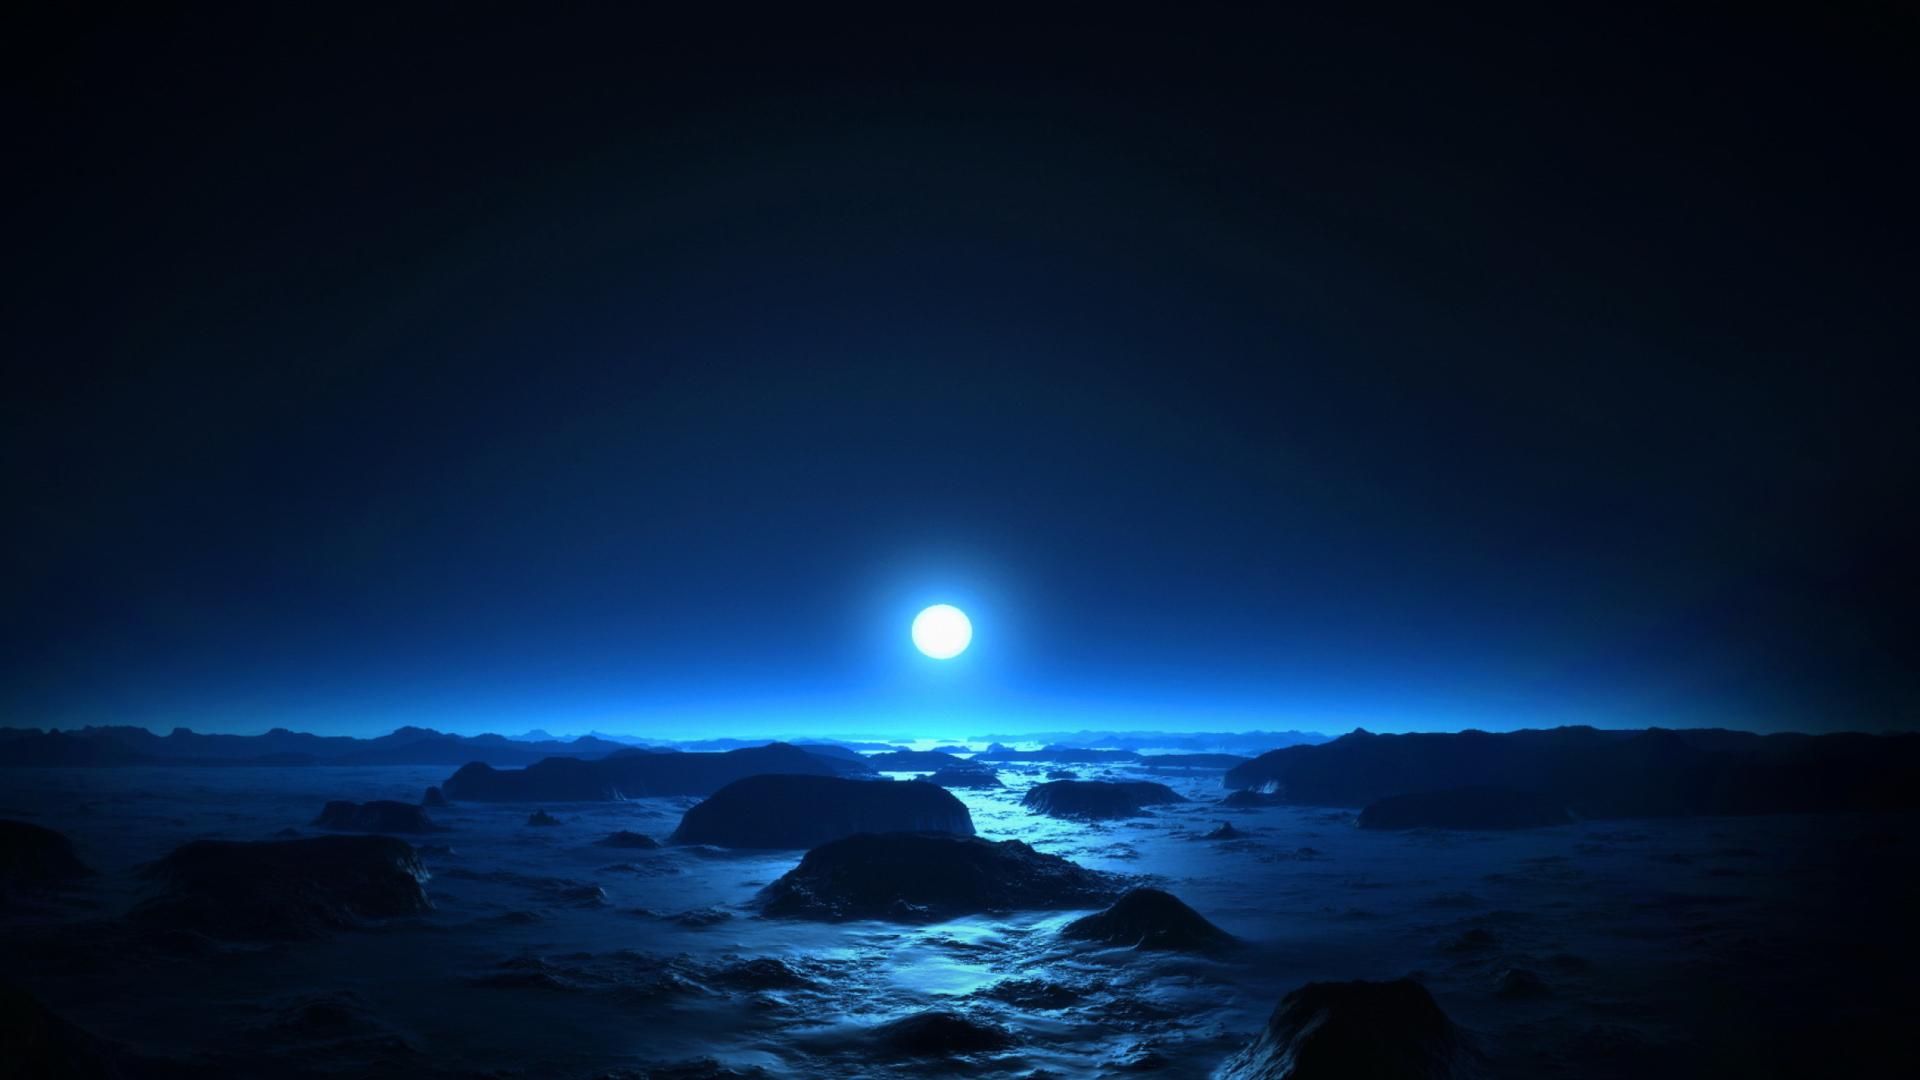 Cold planet papel de parede para celular para desktop for Sfondi spazio full hd